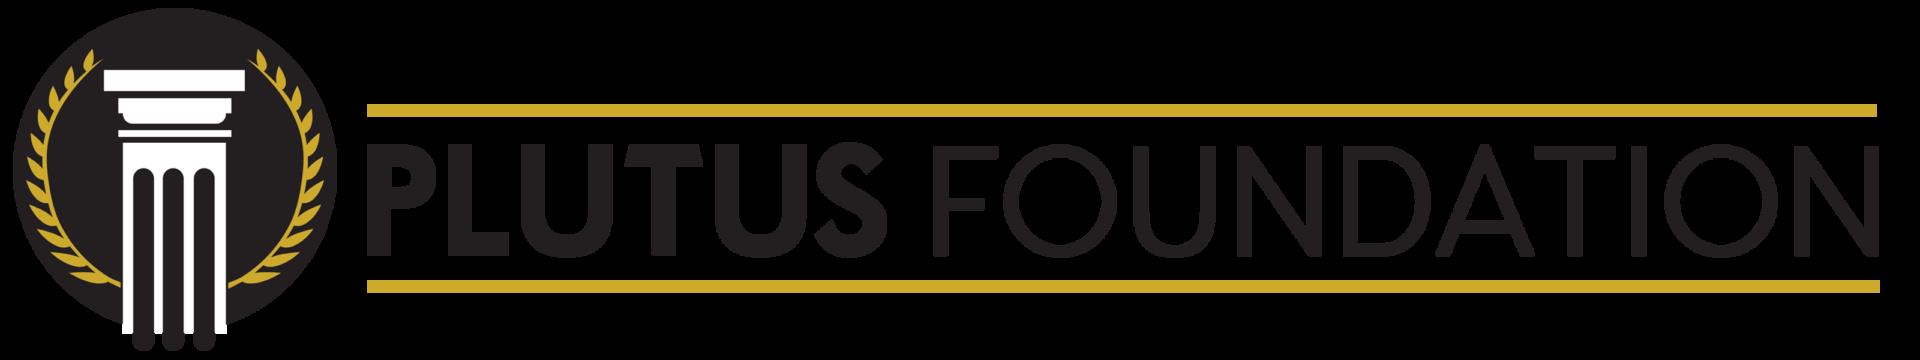 cropped-plutus-foundation-3